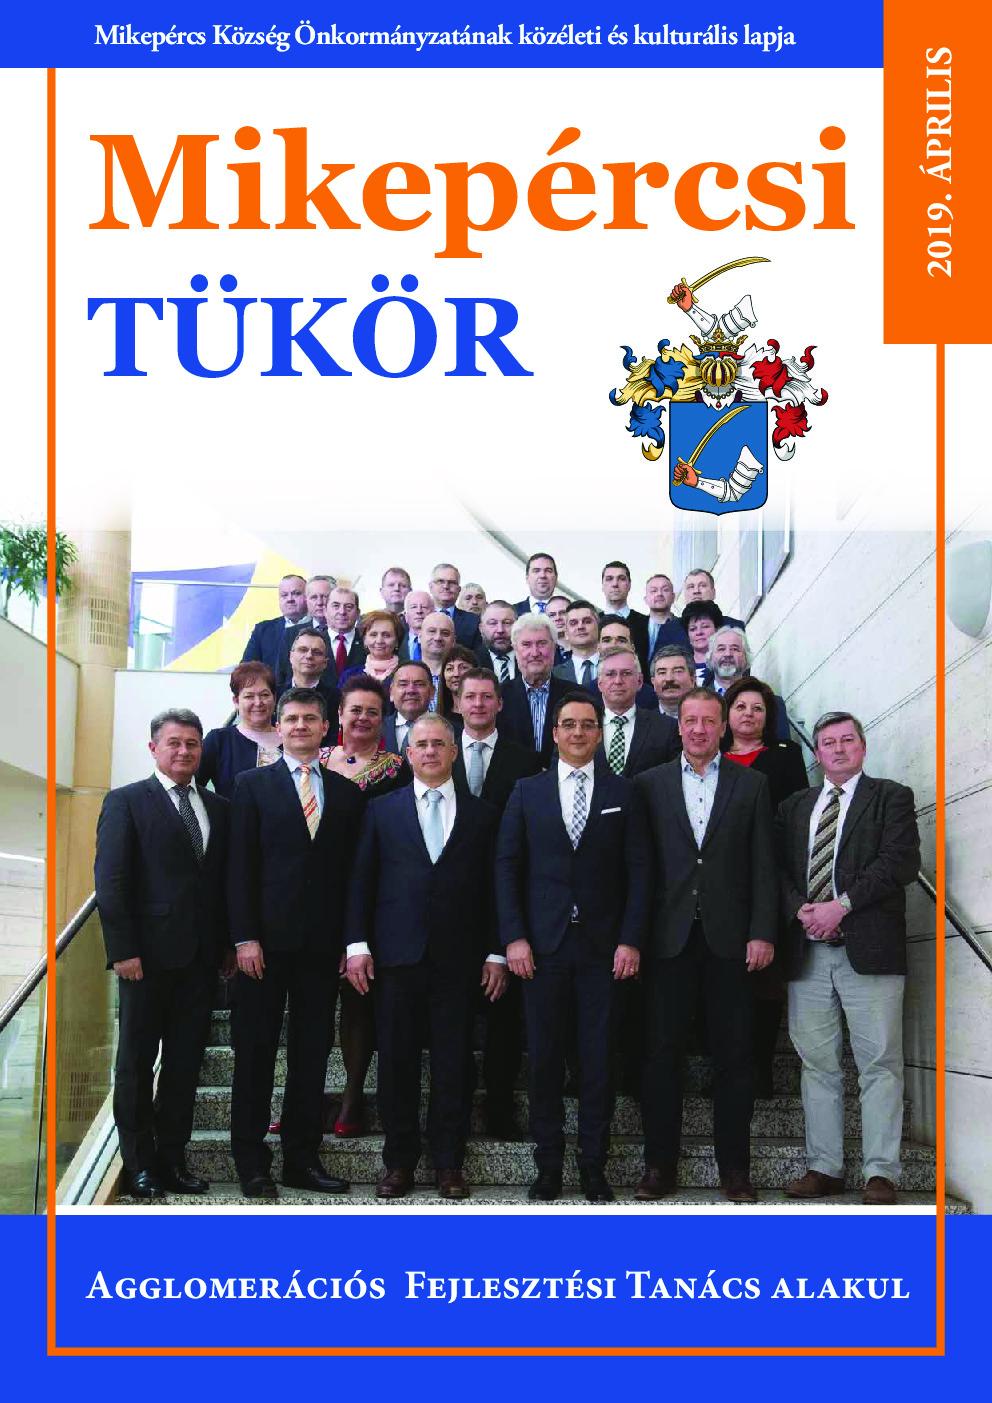 Mikepércsi Tükör 2019. Április